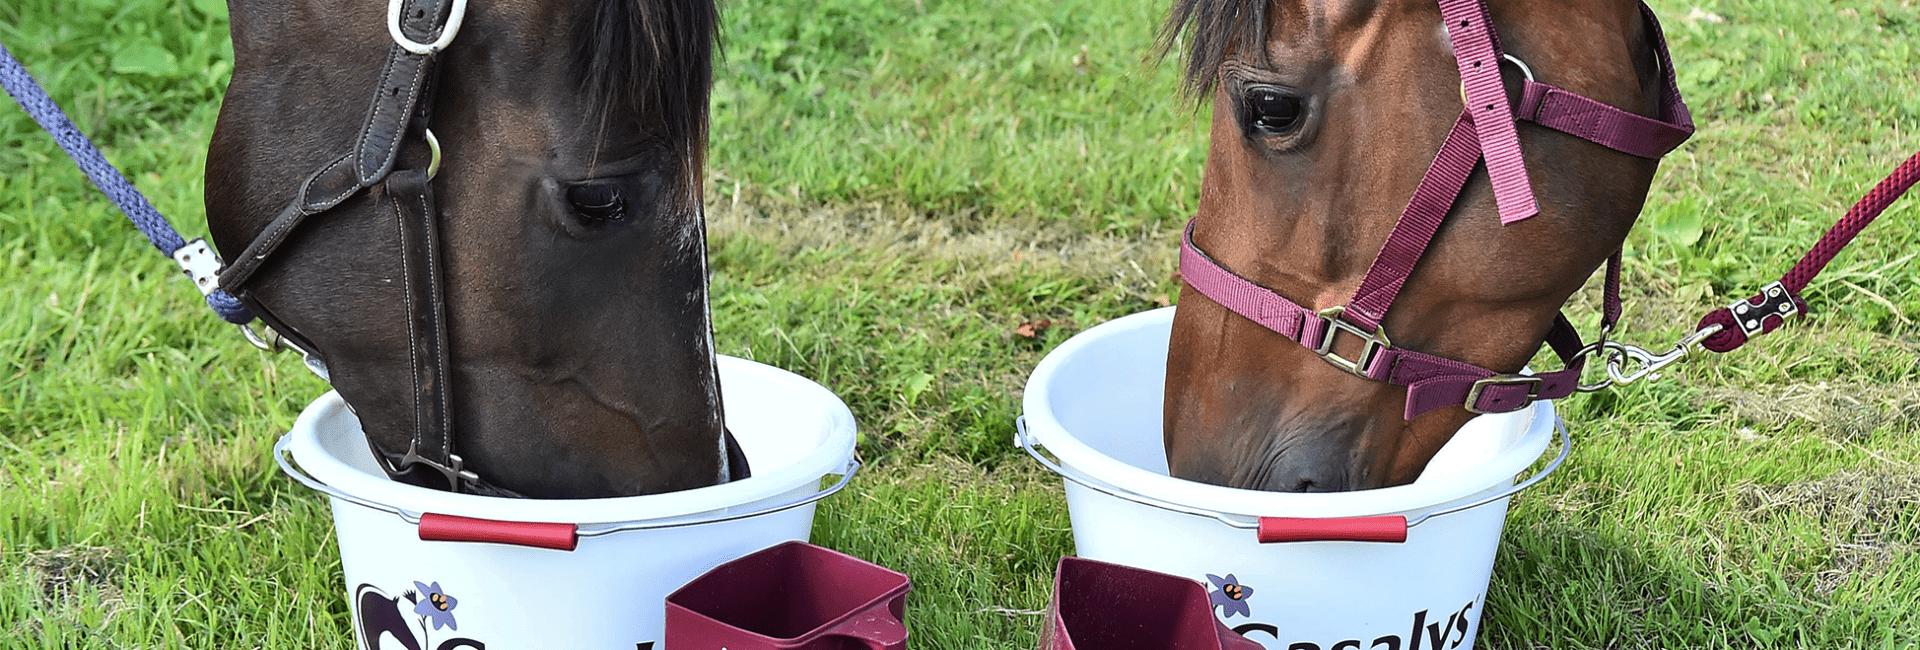 chevaux en train de manger